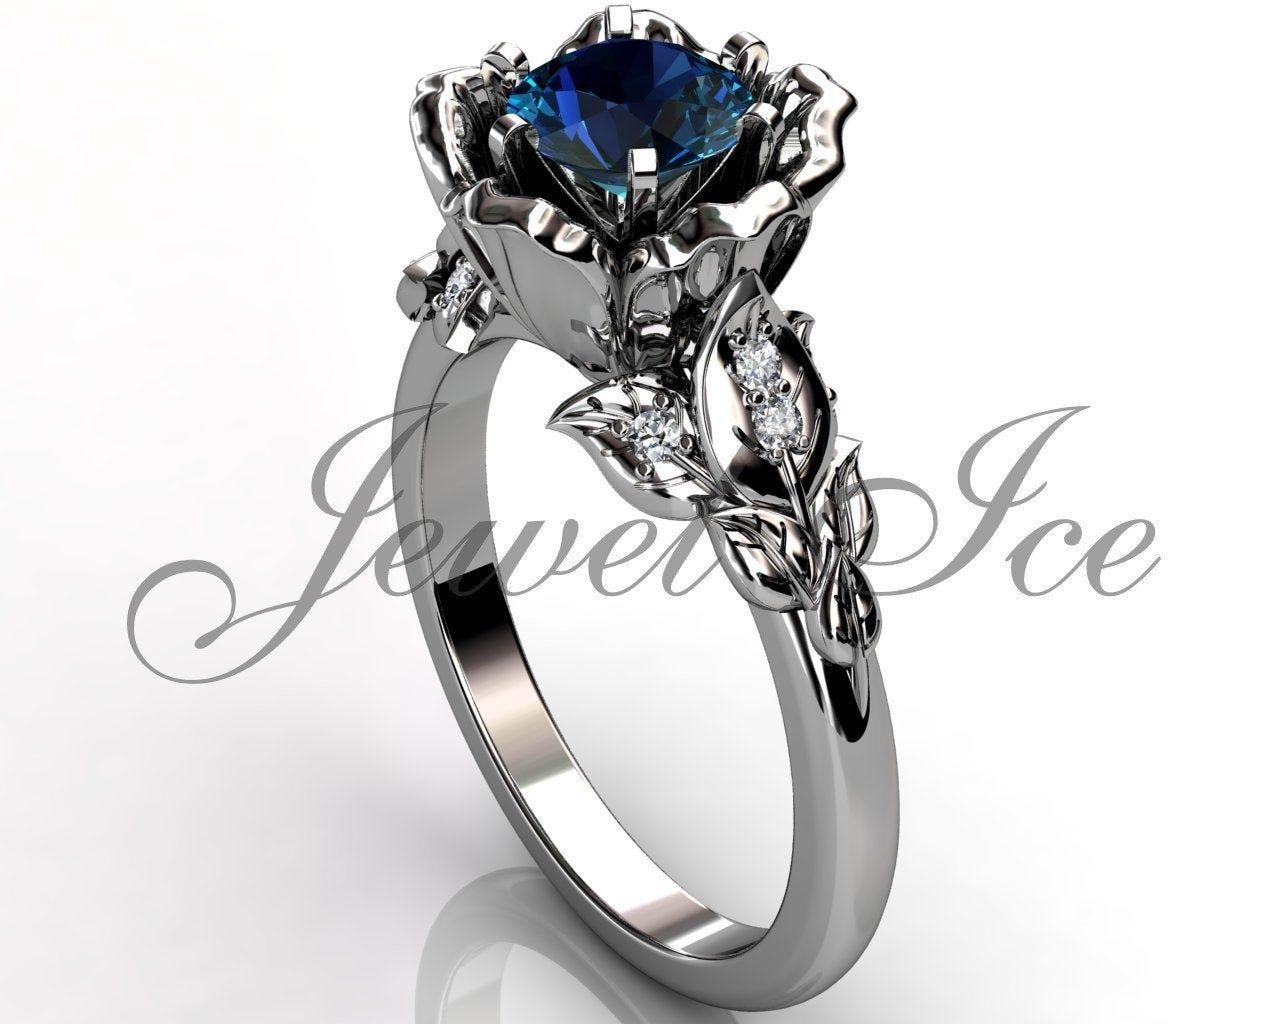 Alexandrite genuine diamond engagement ring 14k white